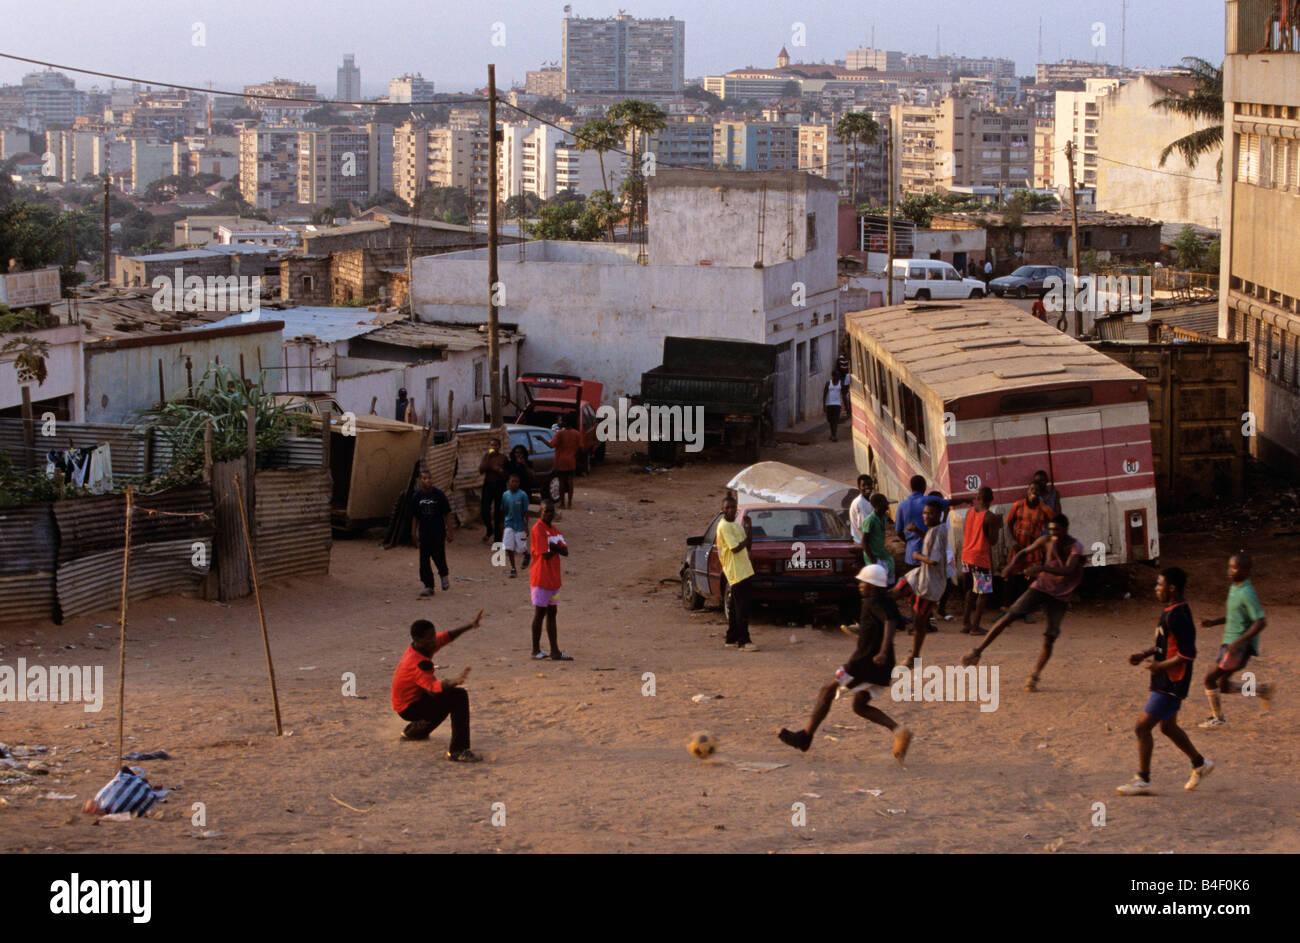 Young men playing football on city wasteland, Luanda, Angola, Africa. - Stock Image